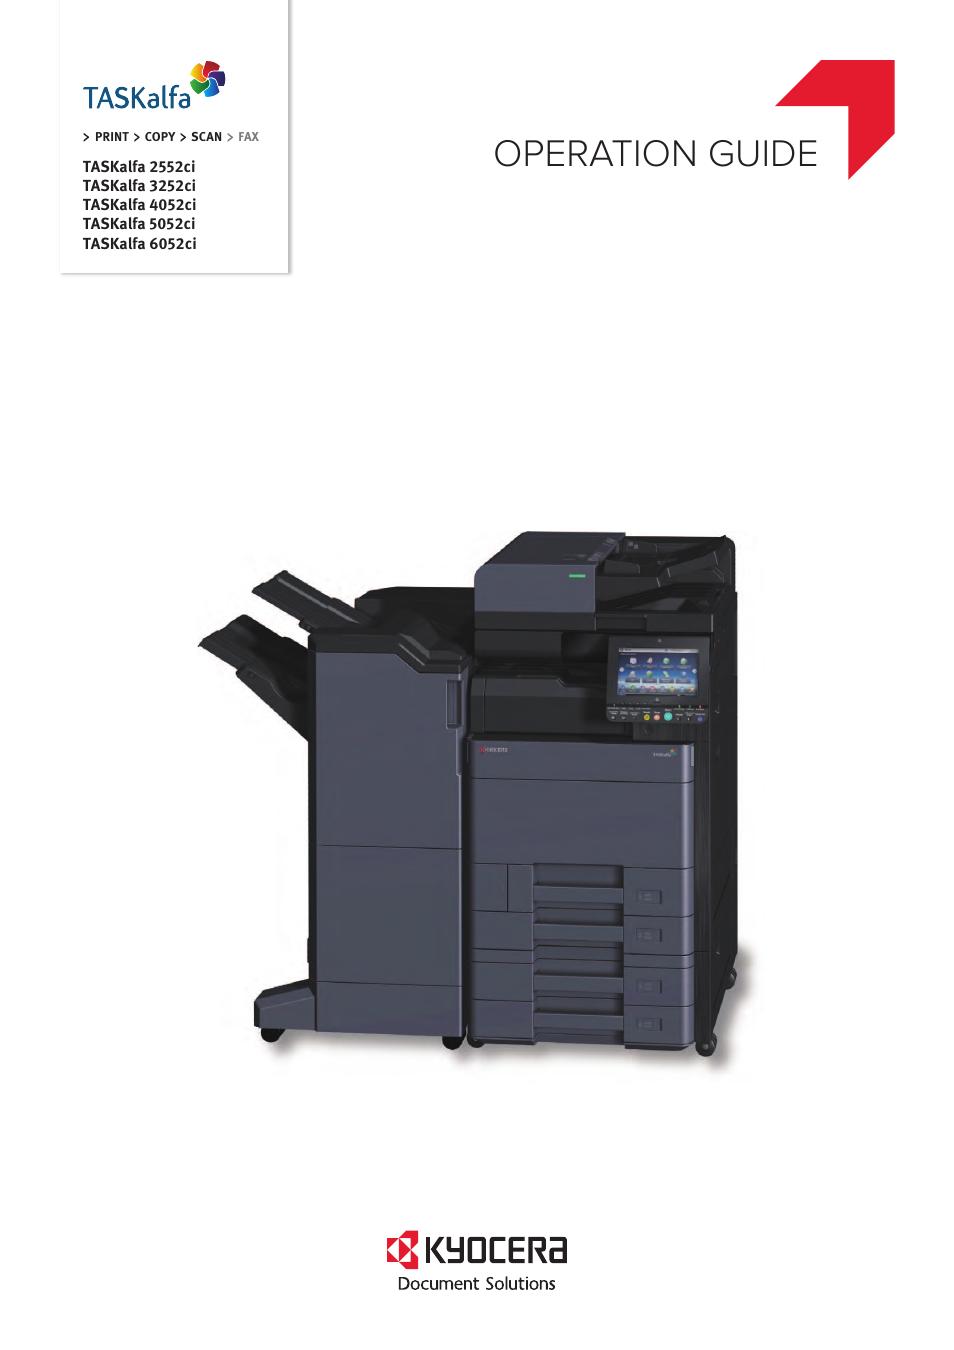 Kyocera TASKalfa 2552ci User Manual | 682 pages